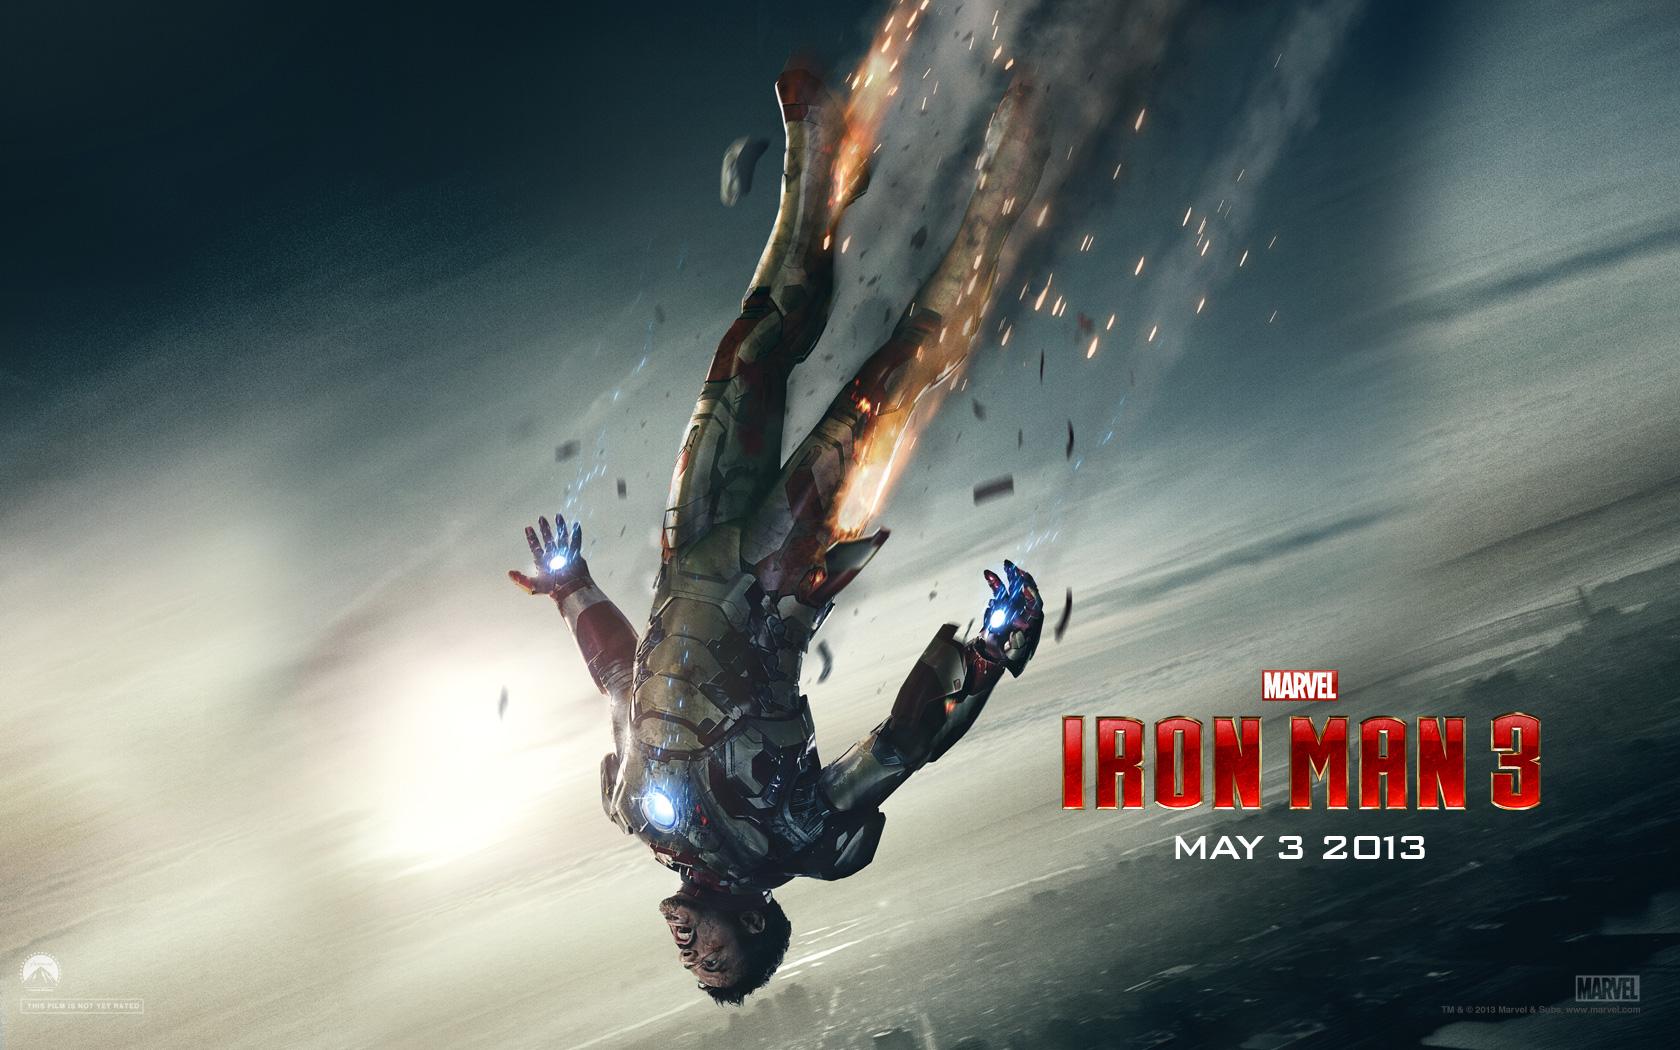 Iron Man 3 iron man 3 33557277 1680 1050jpg 1680x1050